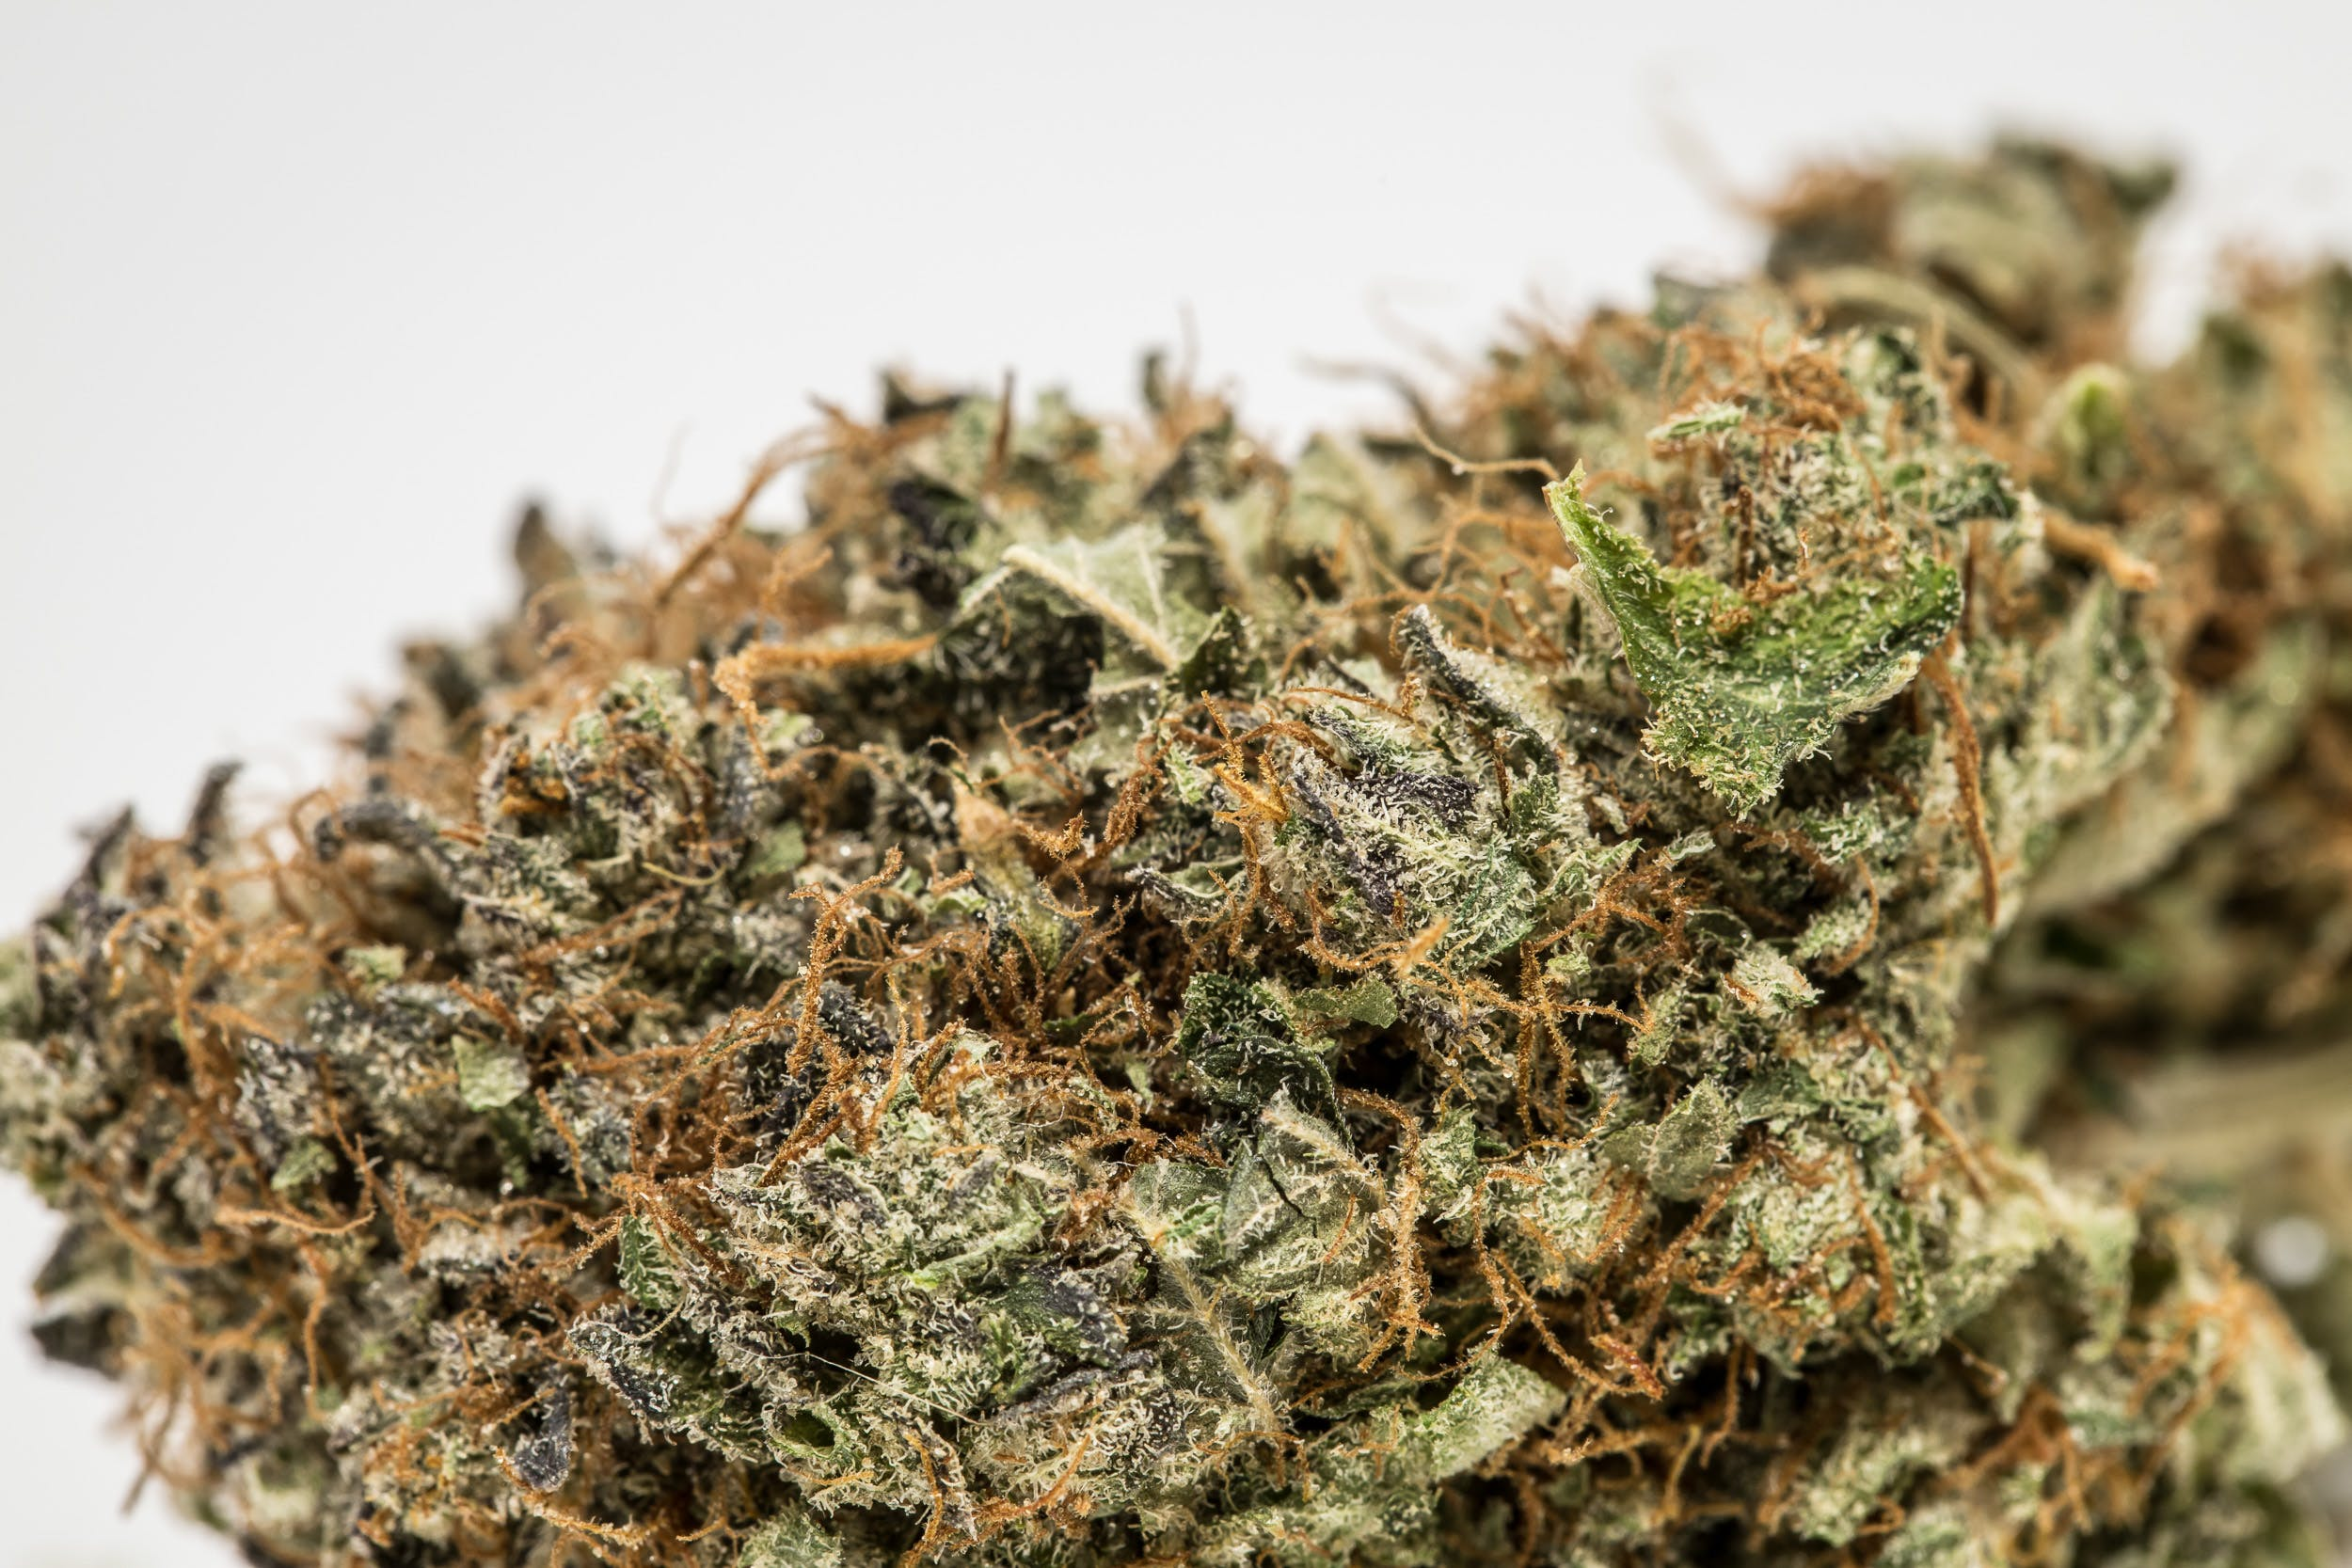 Mendo Breath Weed; Mendo Breath Cannabis Strain; Mendo Breath Indica Marijuana Strain